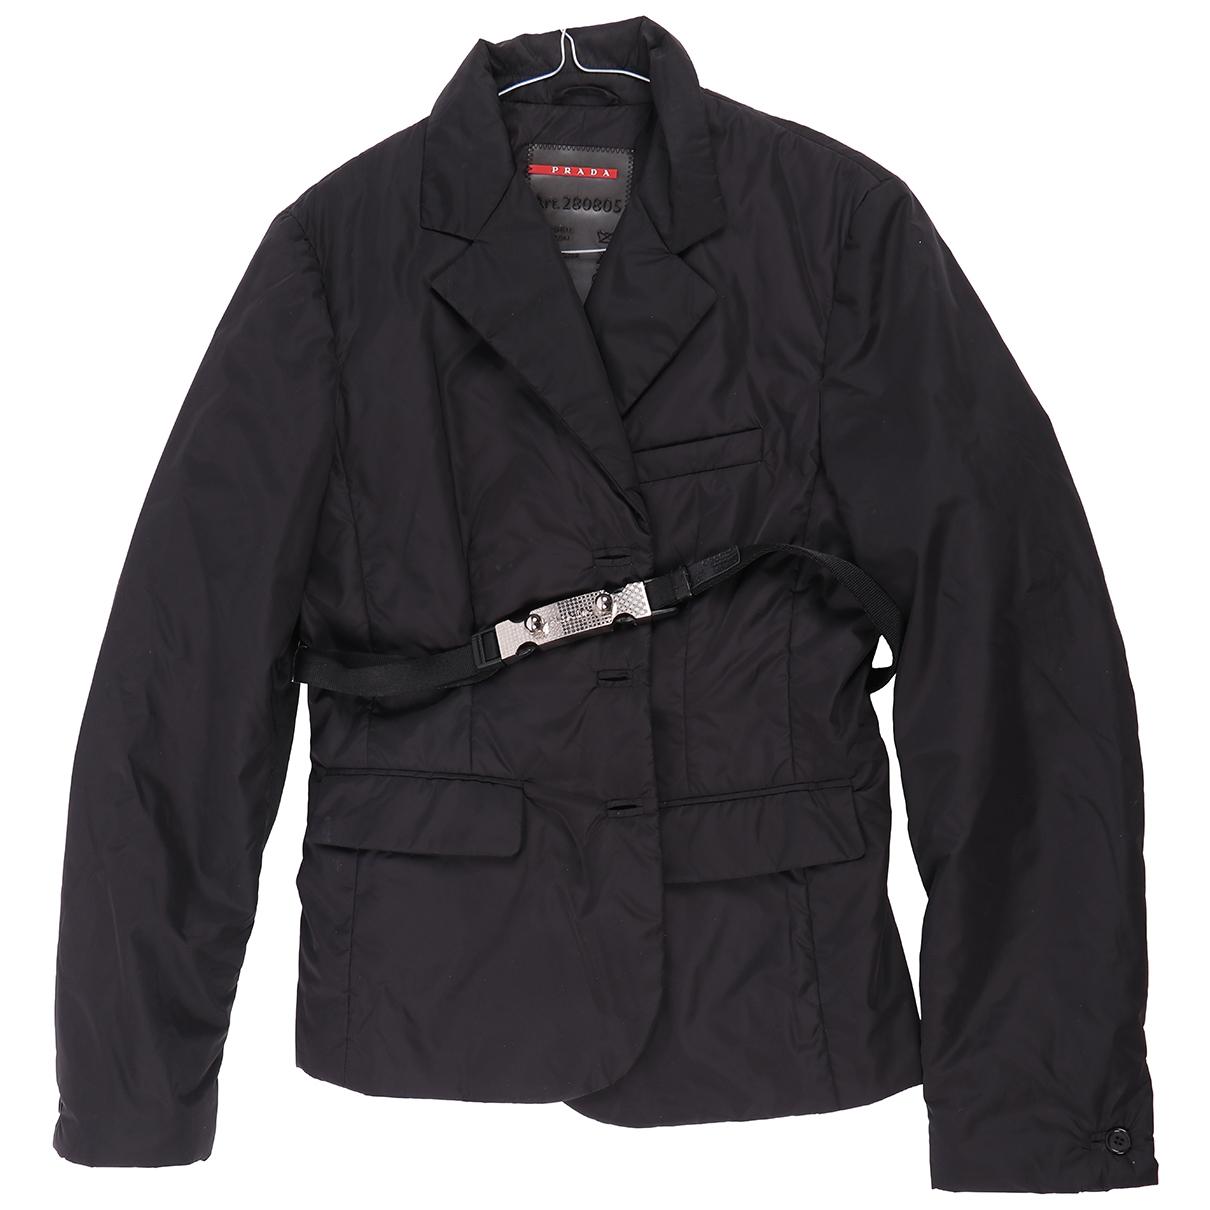 Prada \N Black jacket for Women 46 IT